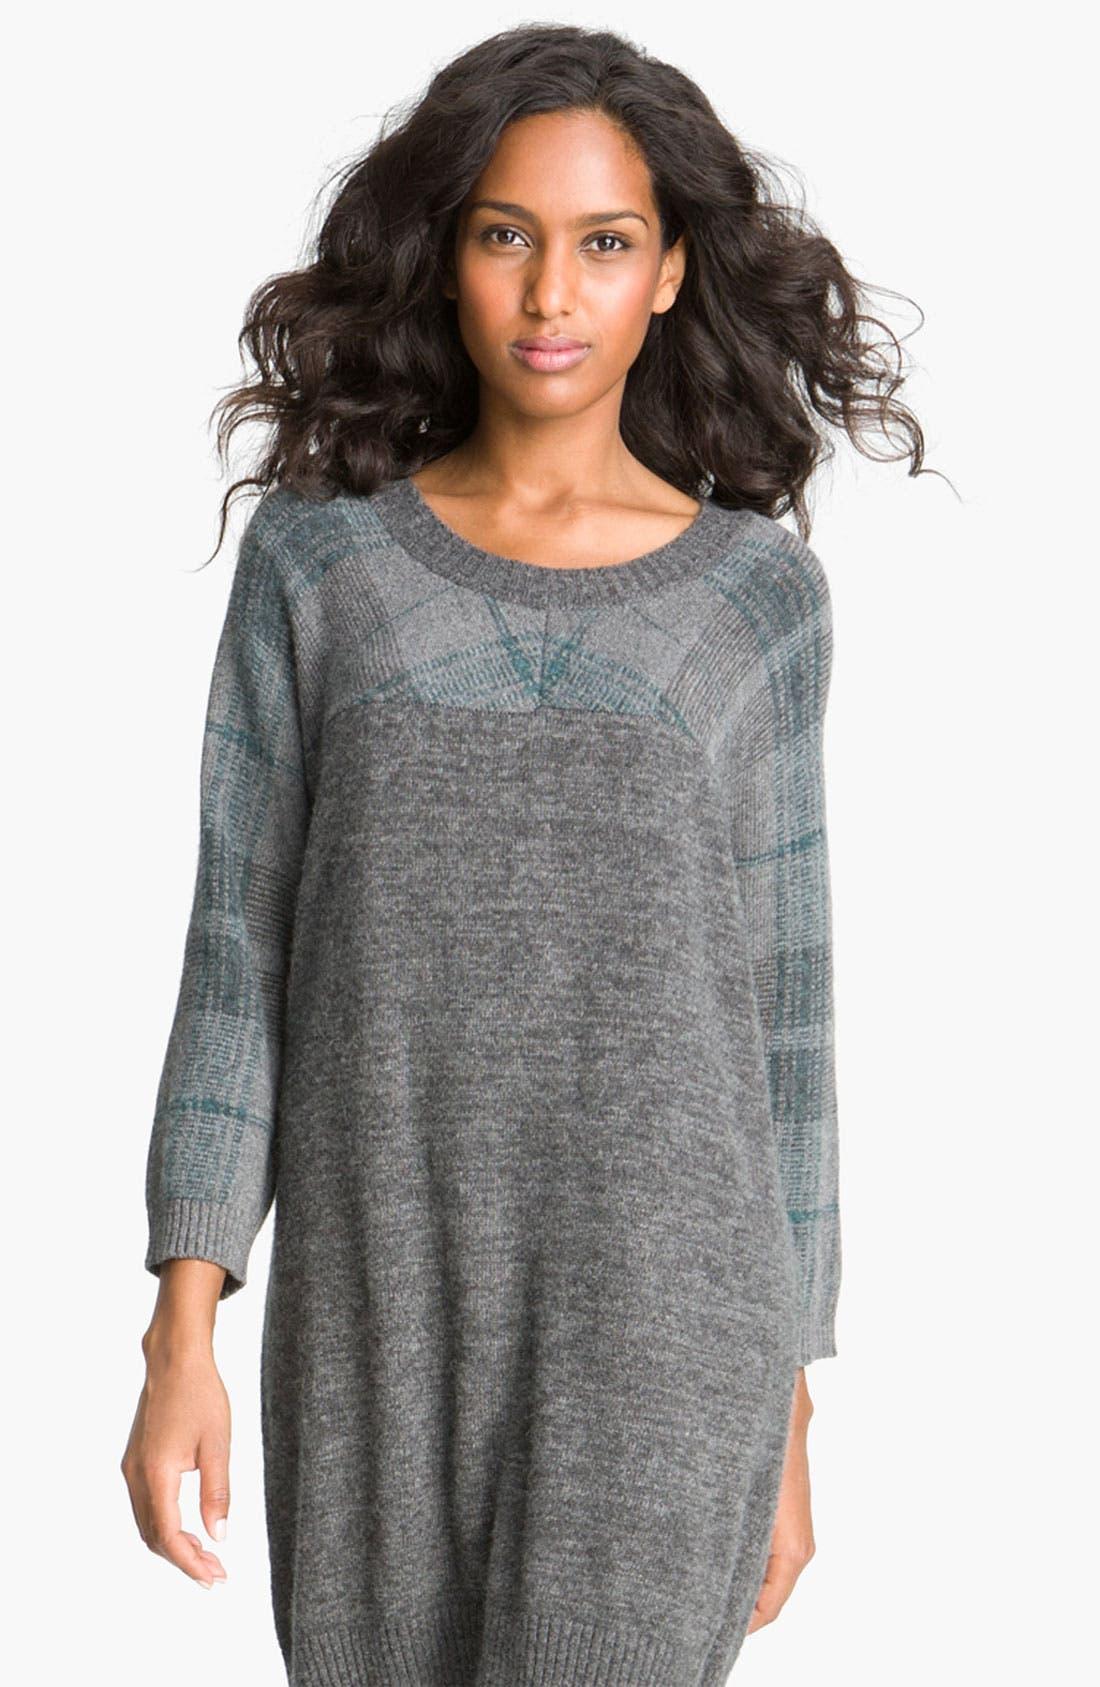 Main Image - Weekend Max Mara 'Sumero' Sweater Dress